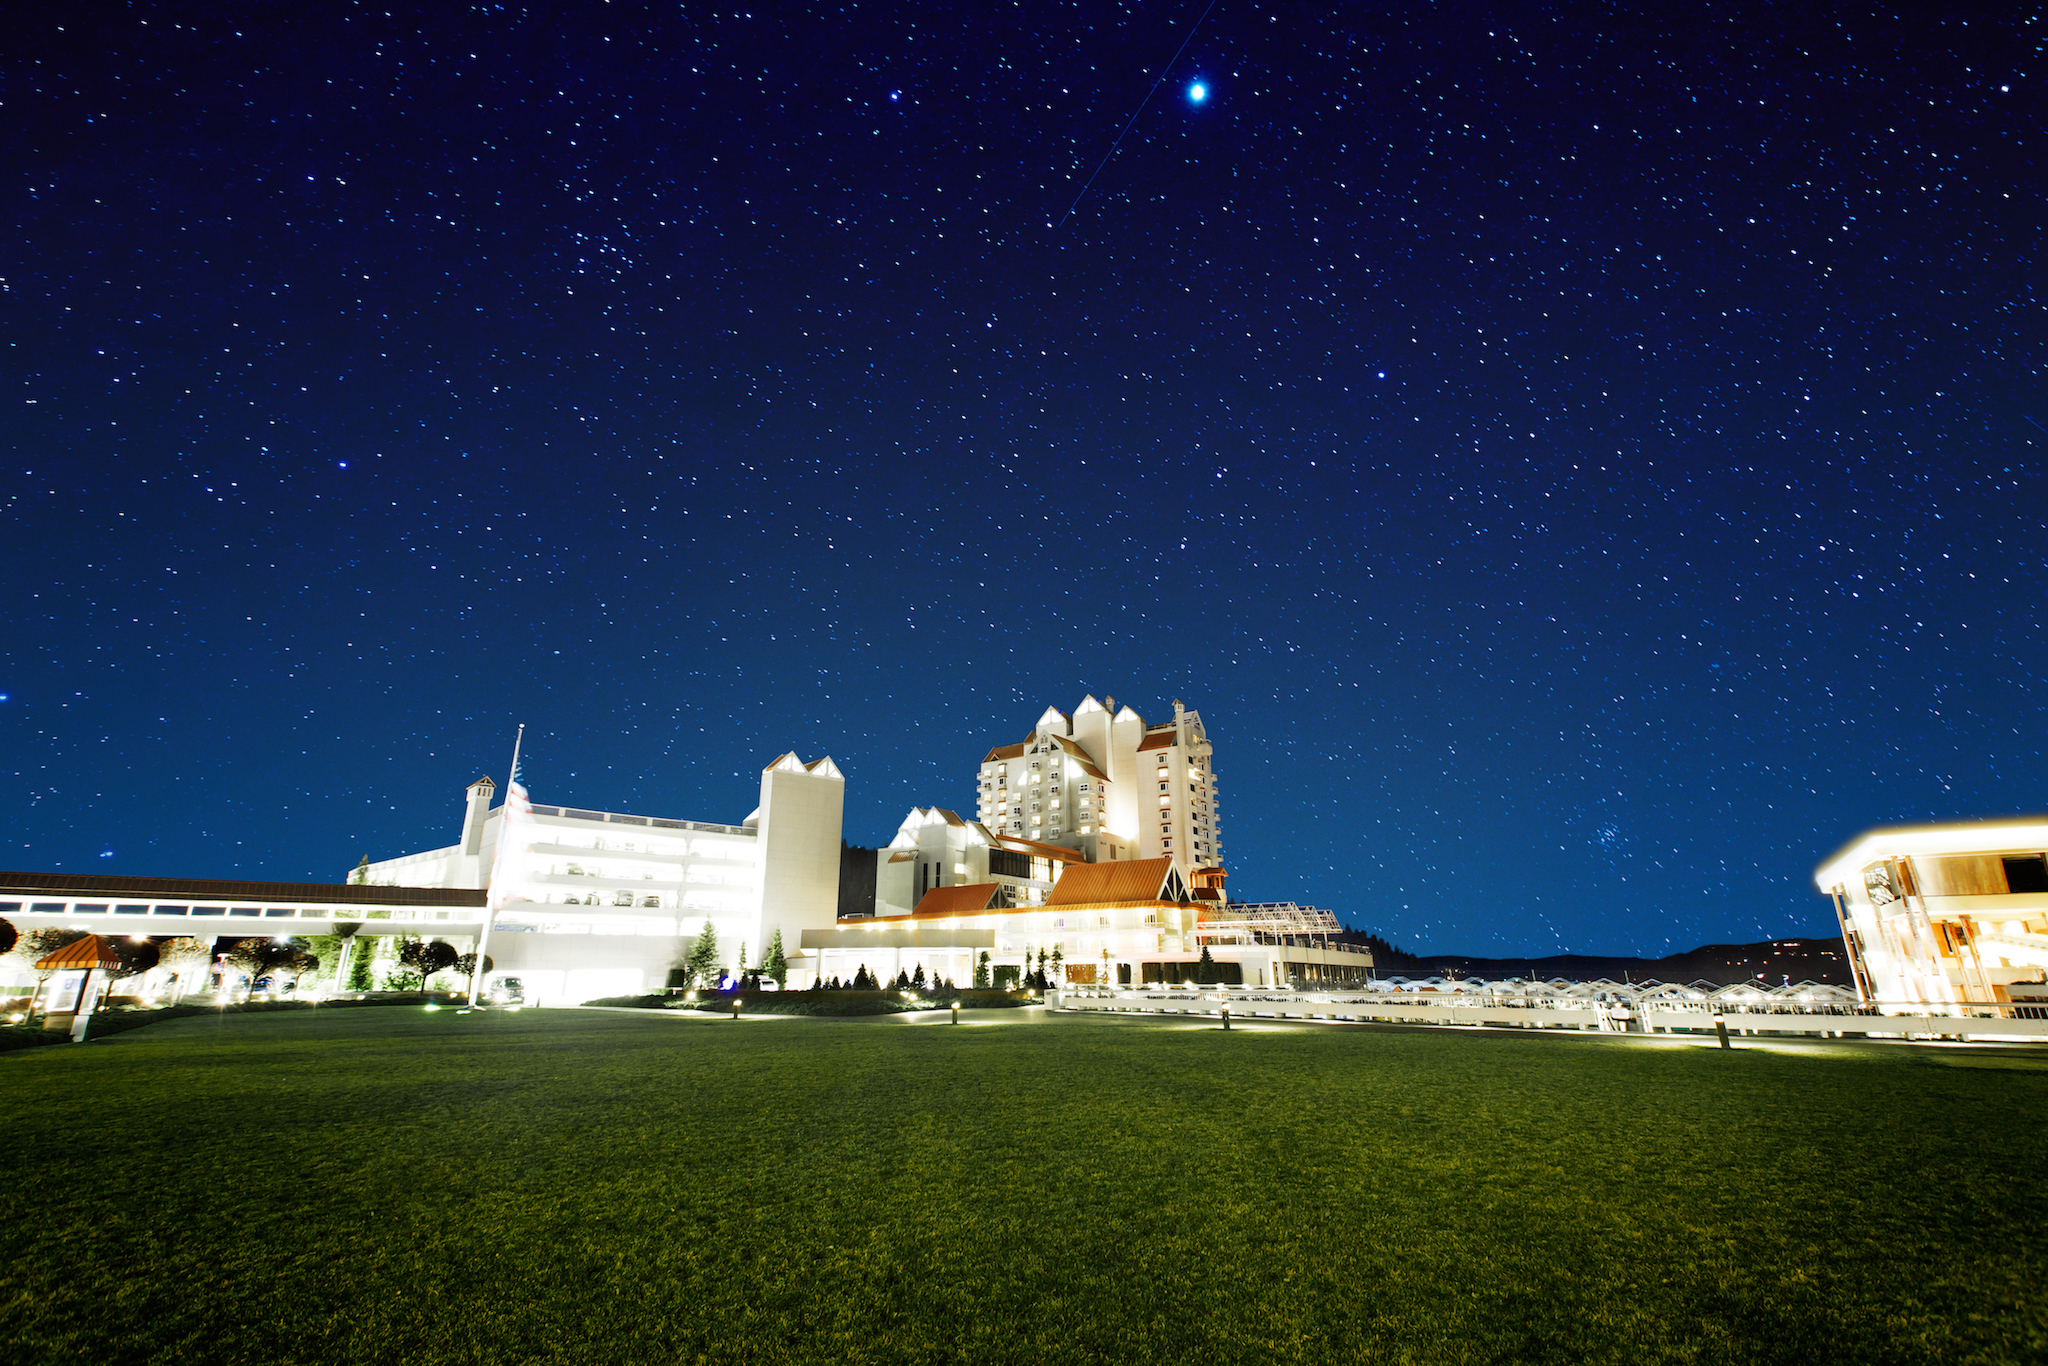 Night sky, The Coeur d'Alene Resort, Coeur d'Alene, Idaho. Photo Credit: Idaho Tourism